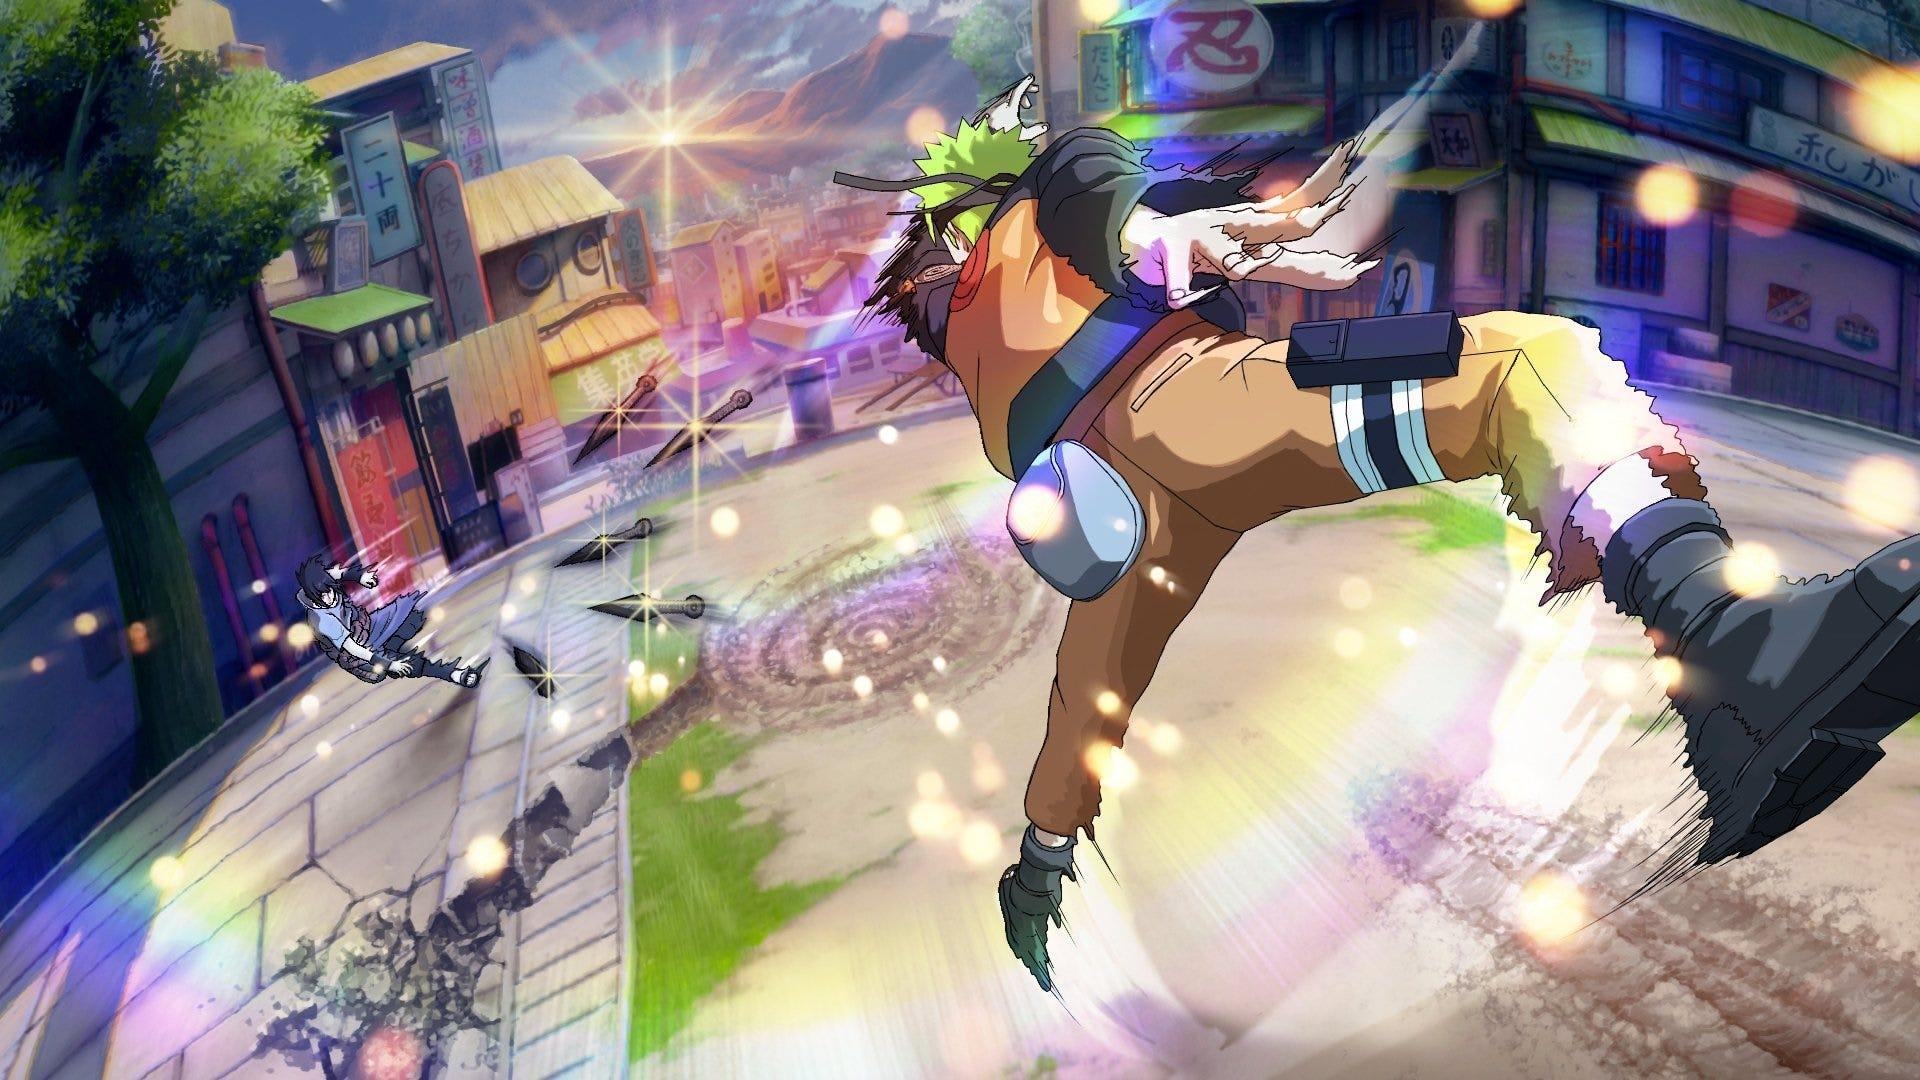 Naruto Shippuden: Ultimate Ninja Storm 4 review | Technobubble